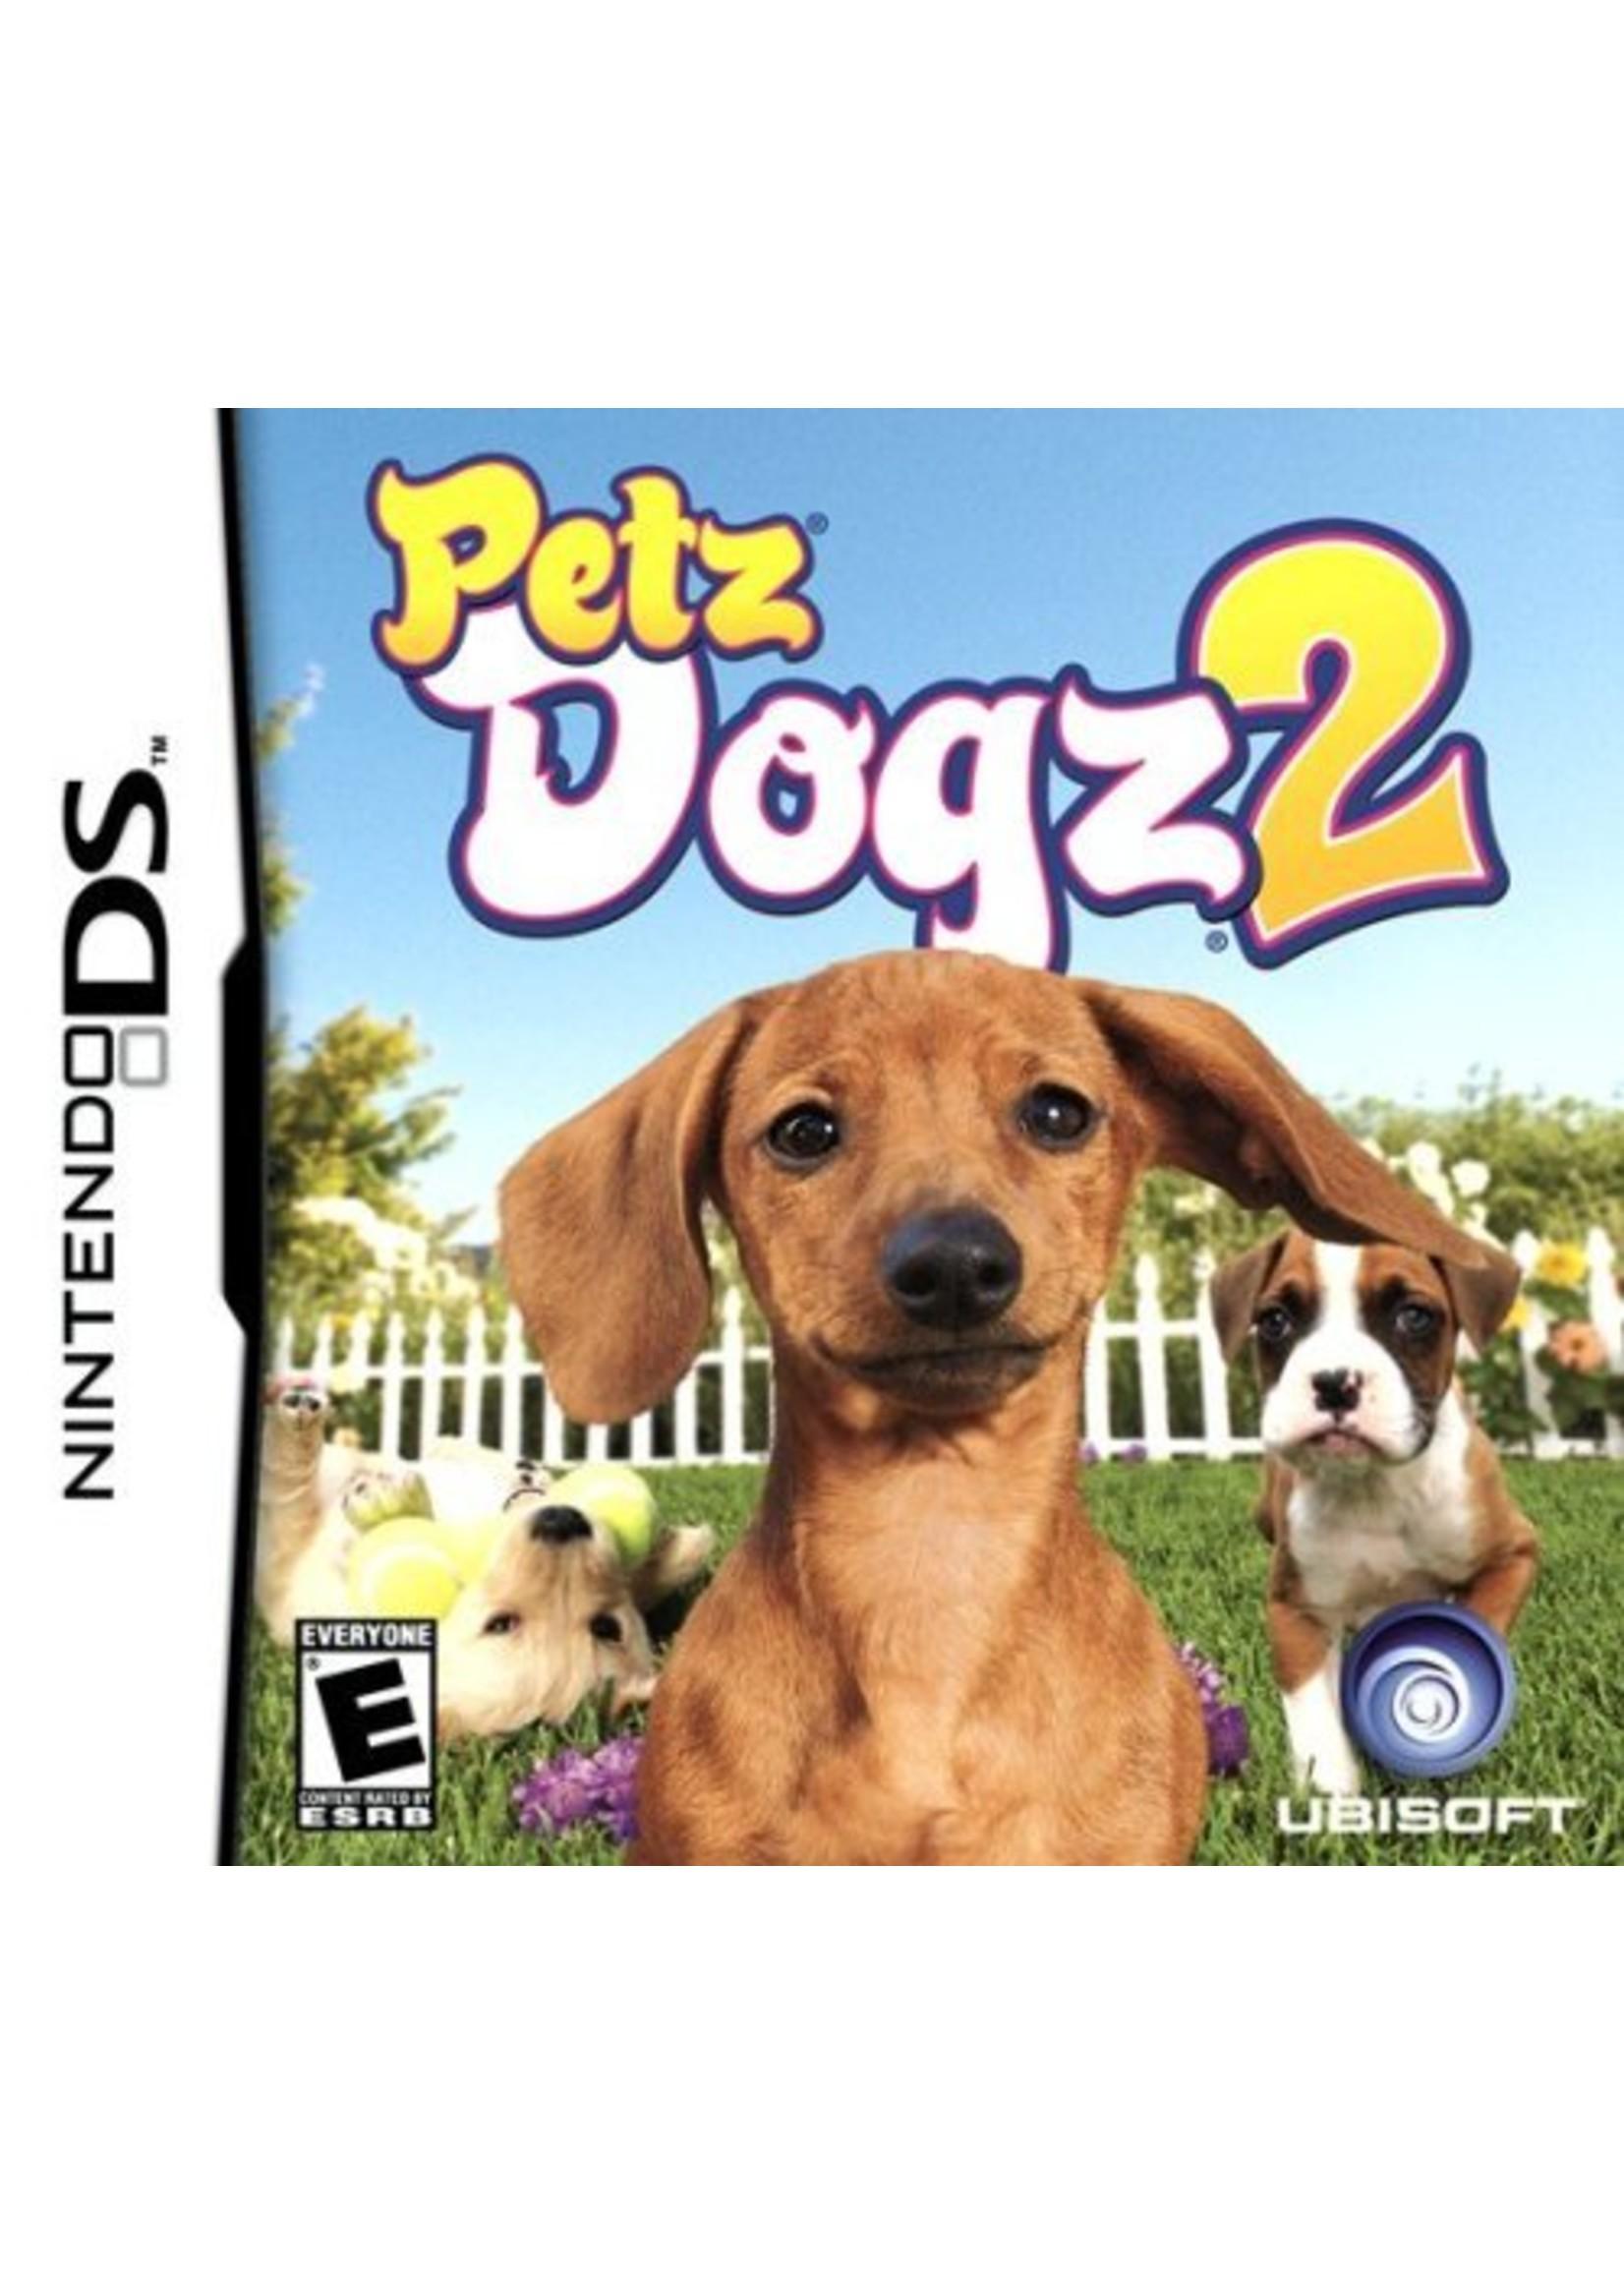 Petz: Dogz 2 - NDS PrePlayed